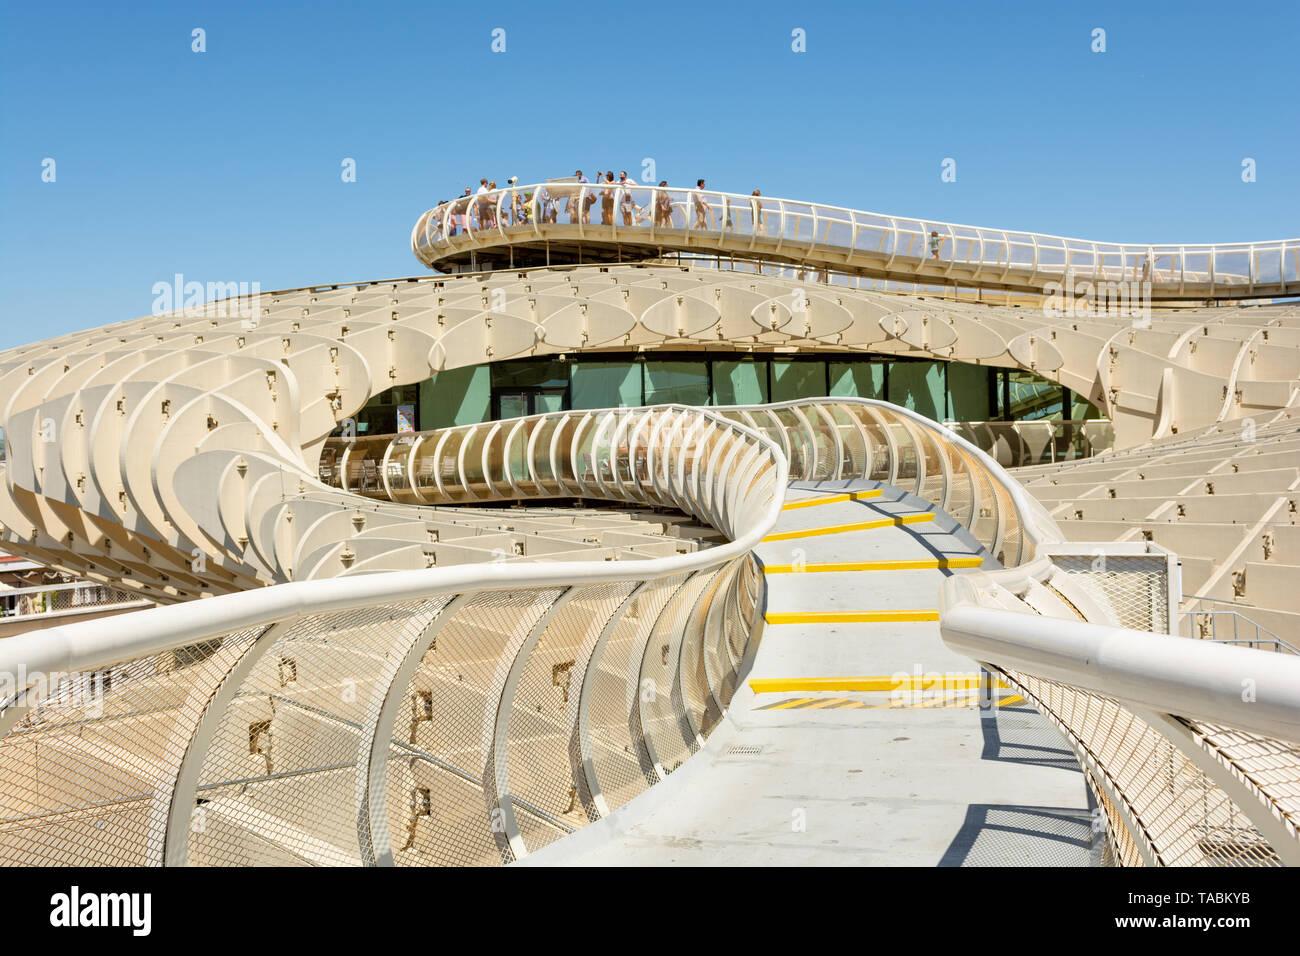 Twisting walkway on top of the Metropol Parasol, La Encarnacion Square, Seville, Andalusia region, Spain - Stock Image